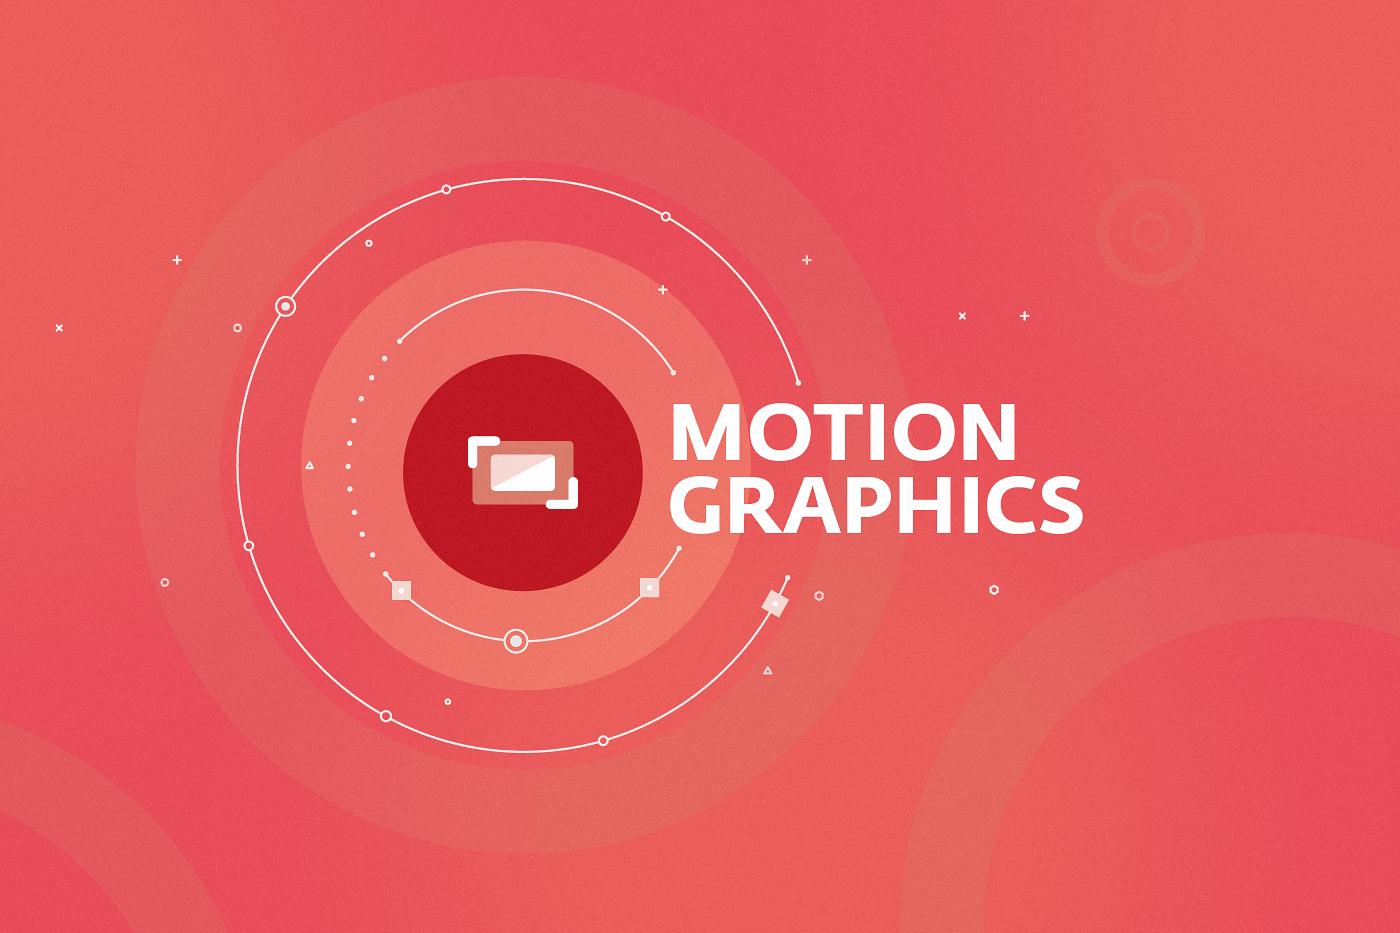 motiongraphics - Motion Graphics